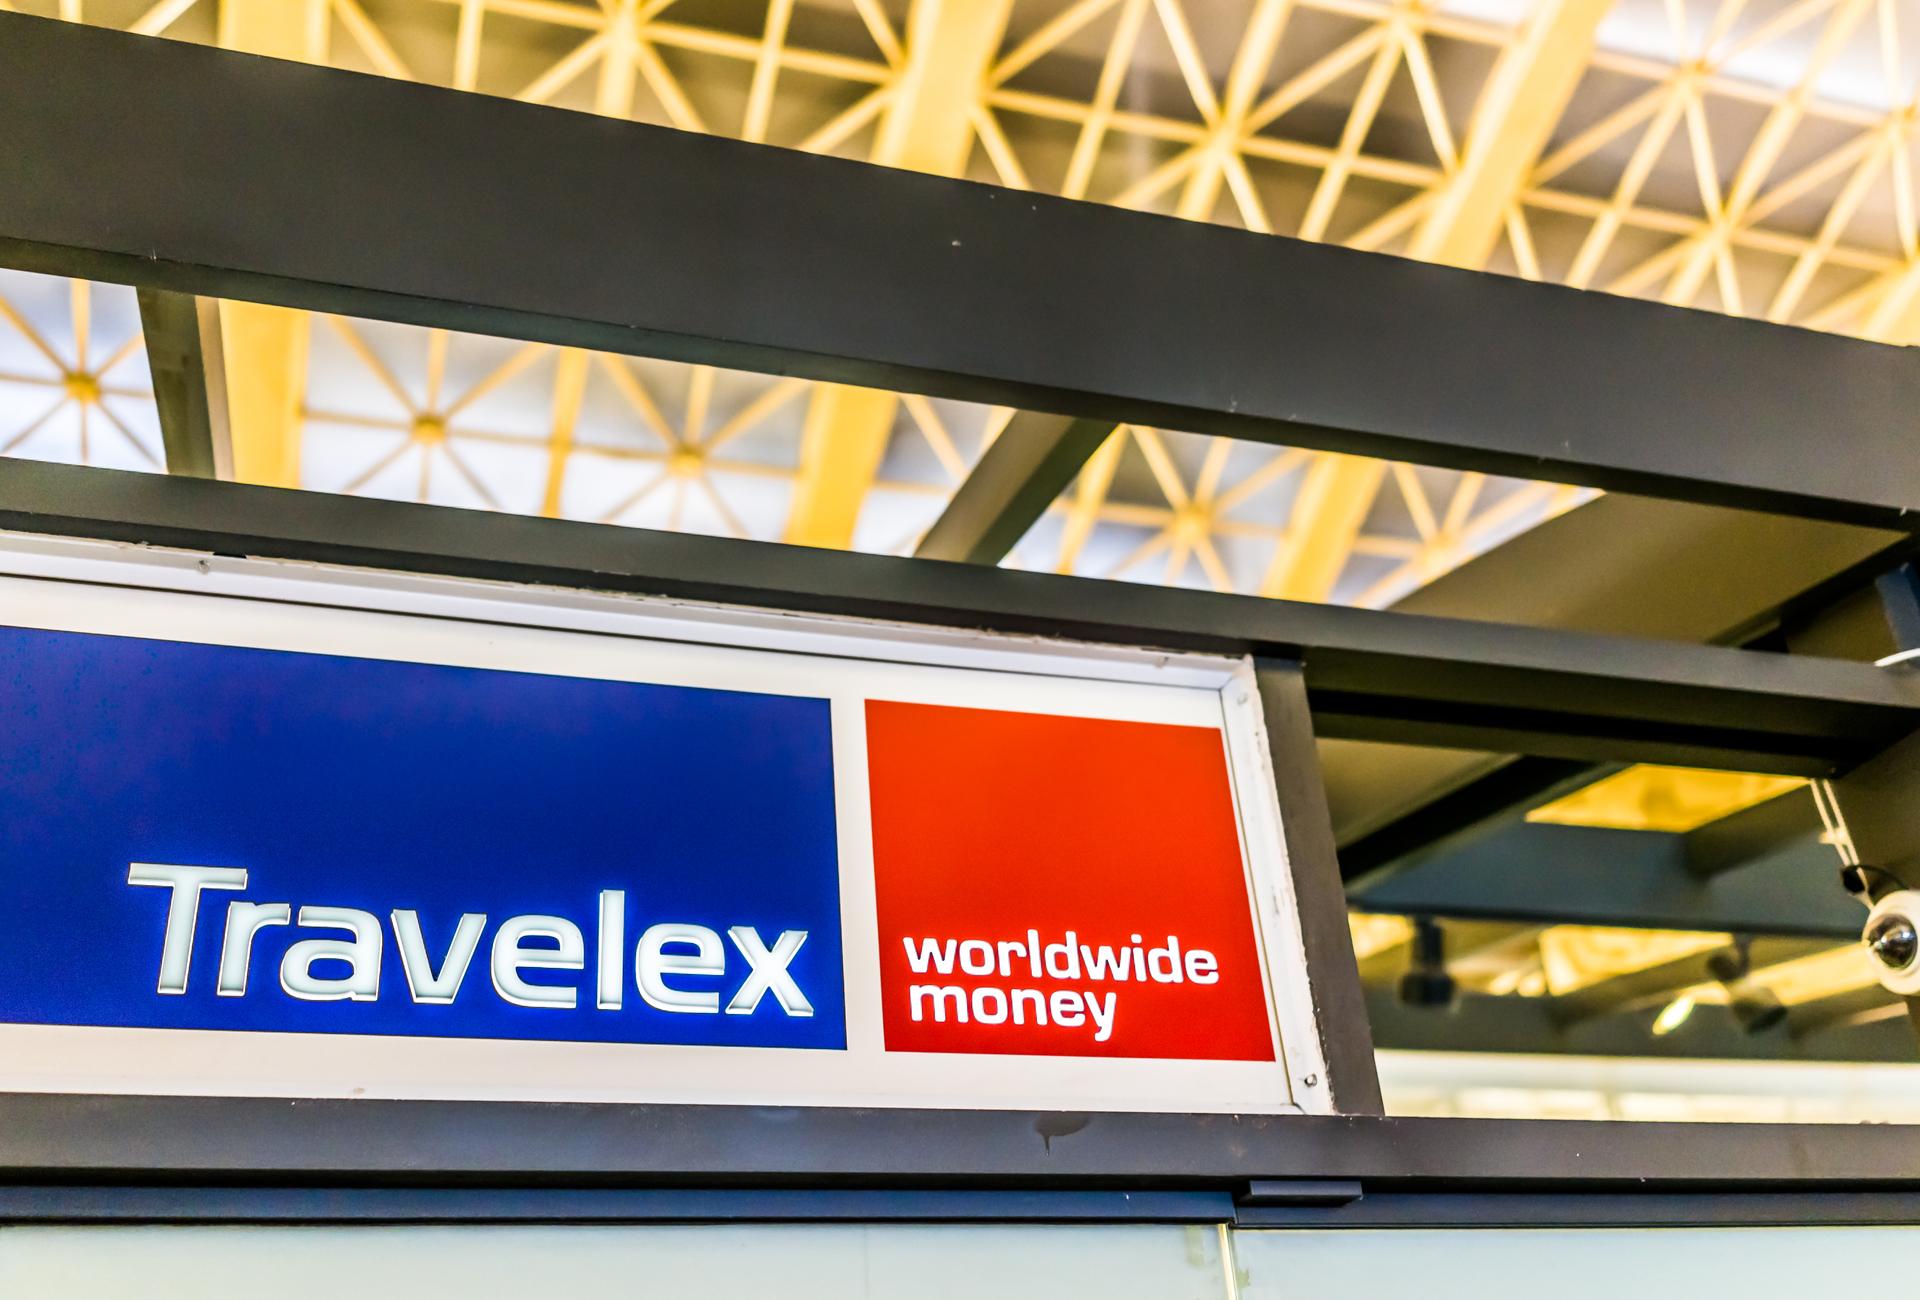 travelex update ransomware hack